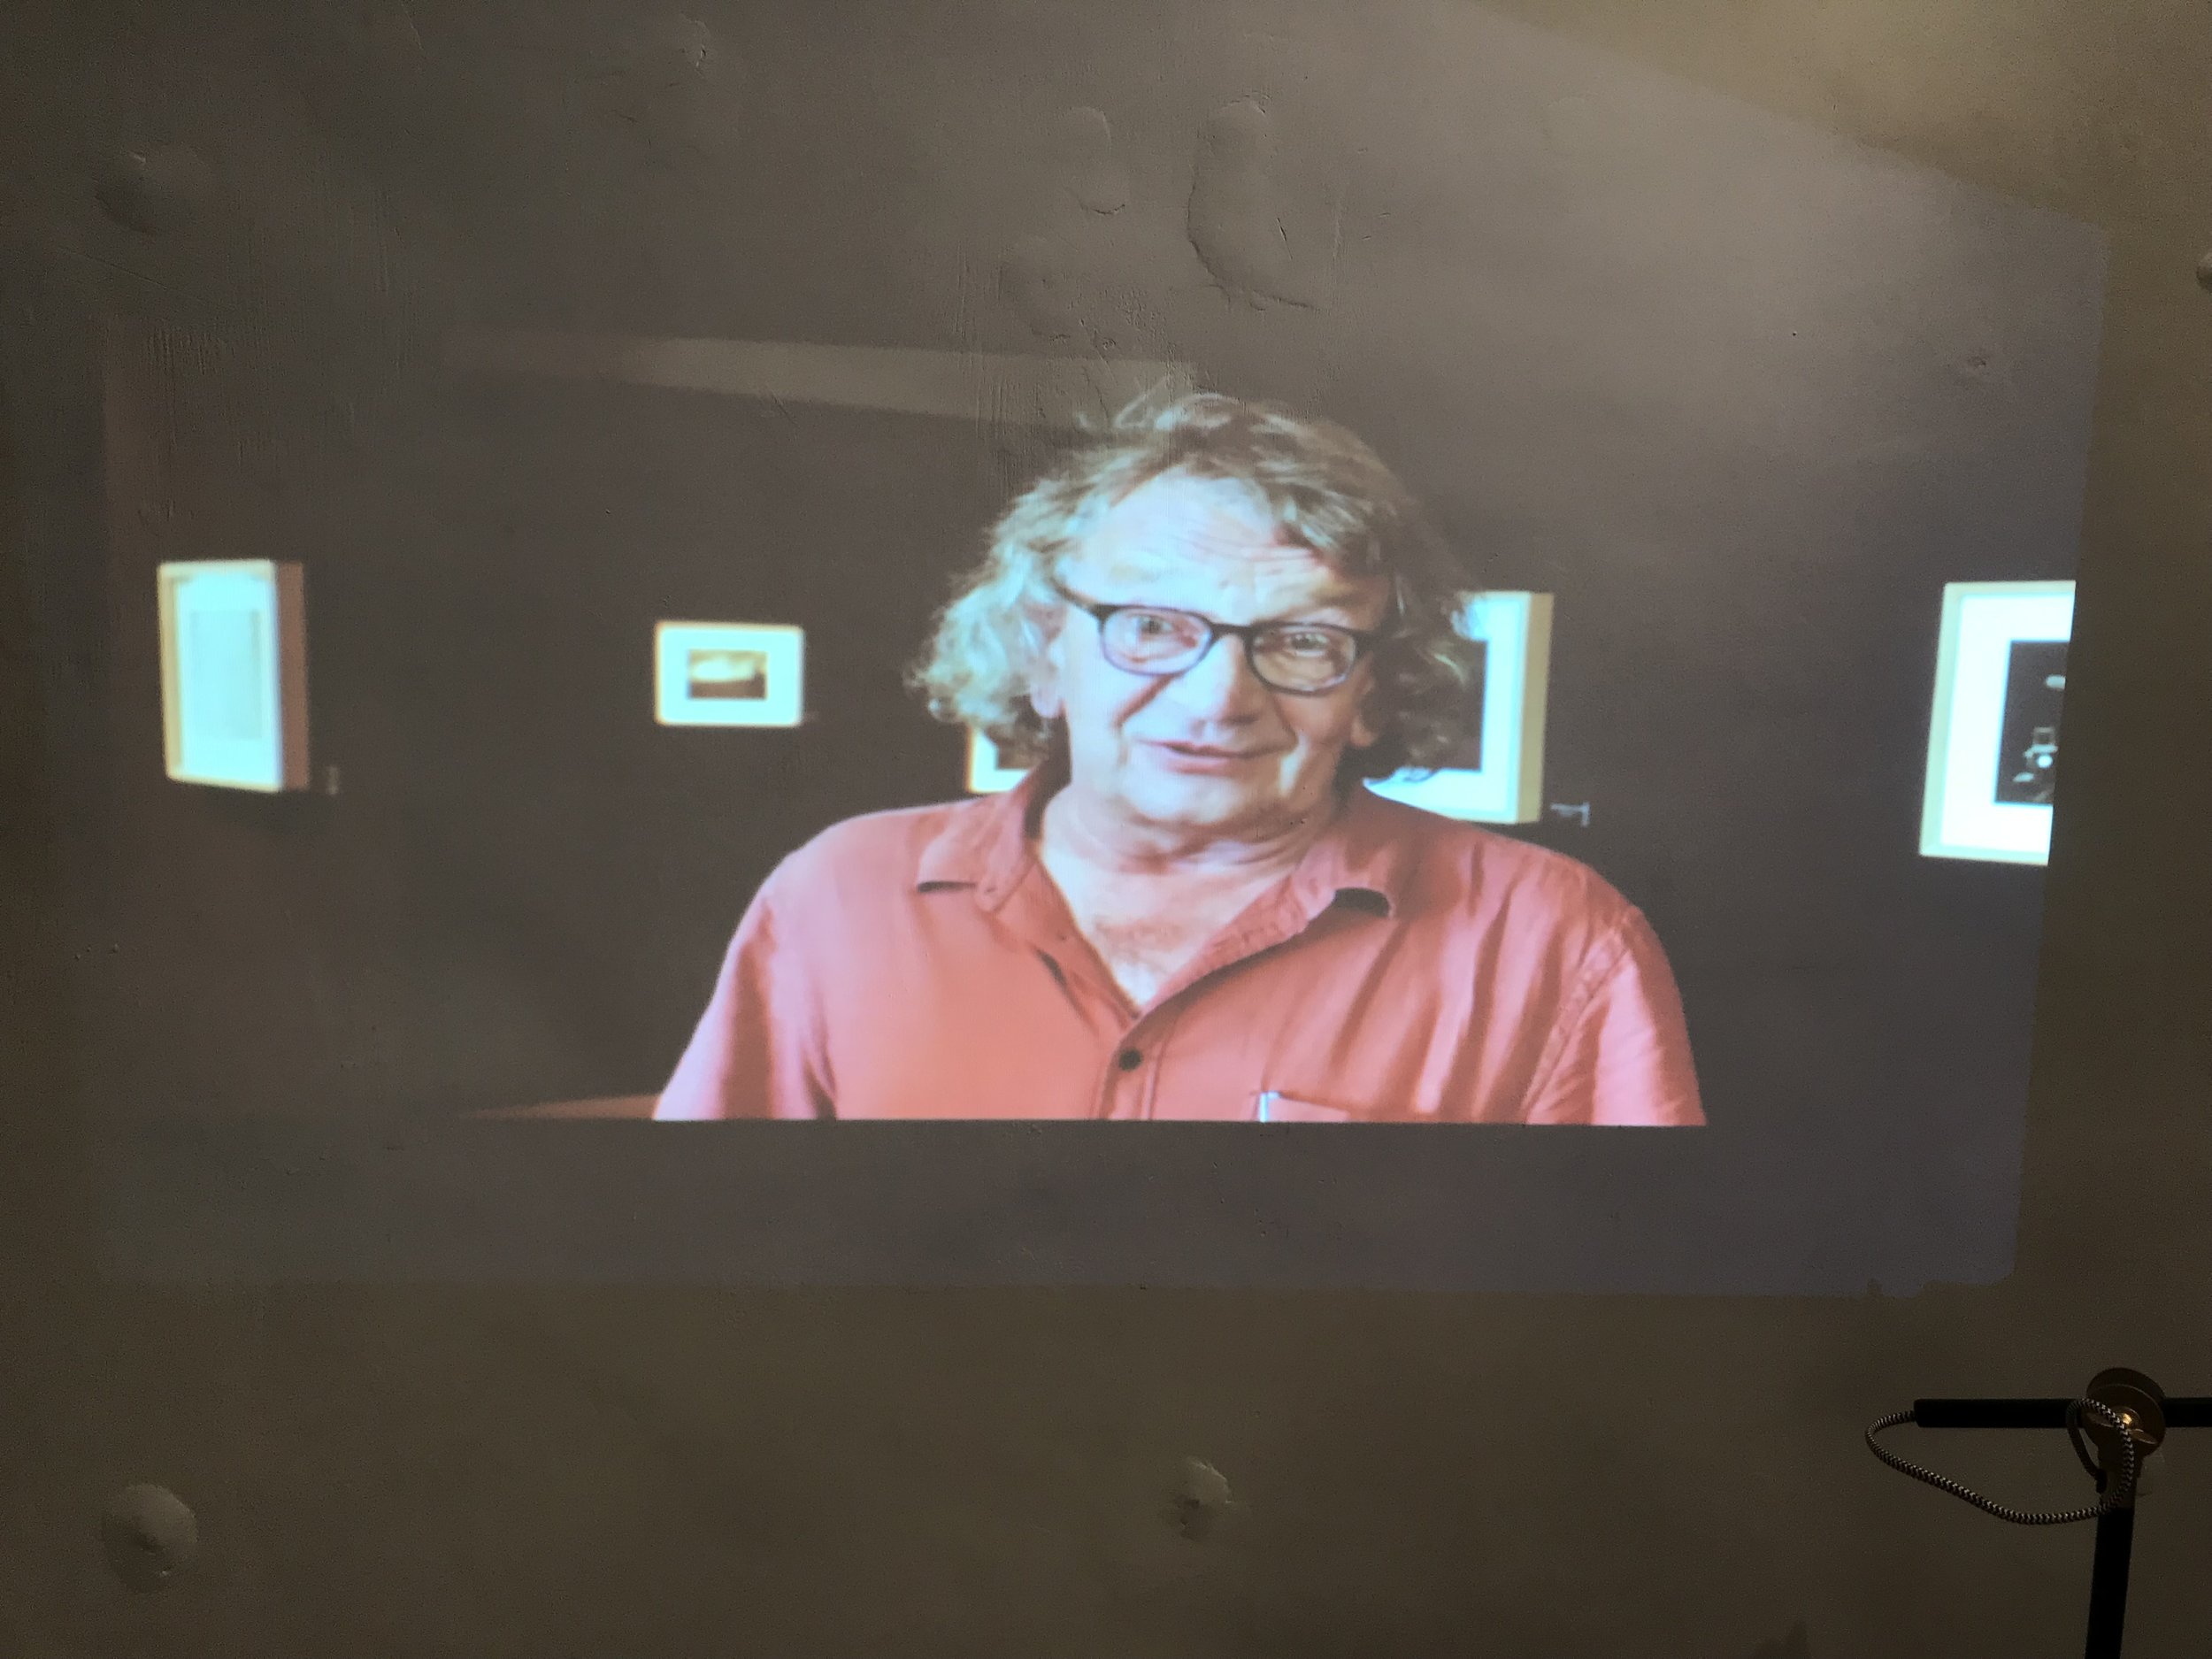 Bogdan Konopka - 出生於波蘭的旅遊攝影師,居住在法國數十年。Konopka的作品在世界各地展出。2003年,其作品系列《The Invisible City》(隱形城市) 在龐比度中心展出,獲得全球讚譽;而他早於1998年,已憑《Paris in grey》(灰色巴黎) 系列,勇奪Grand Prix de la ville de Vevey的歐洲攝影大獎 (European Photography Award)。2019年5月19日與世長辭,享年65歲。